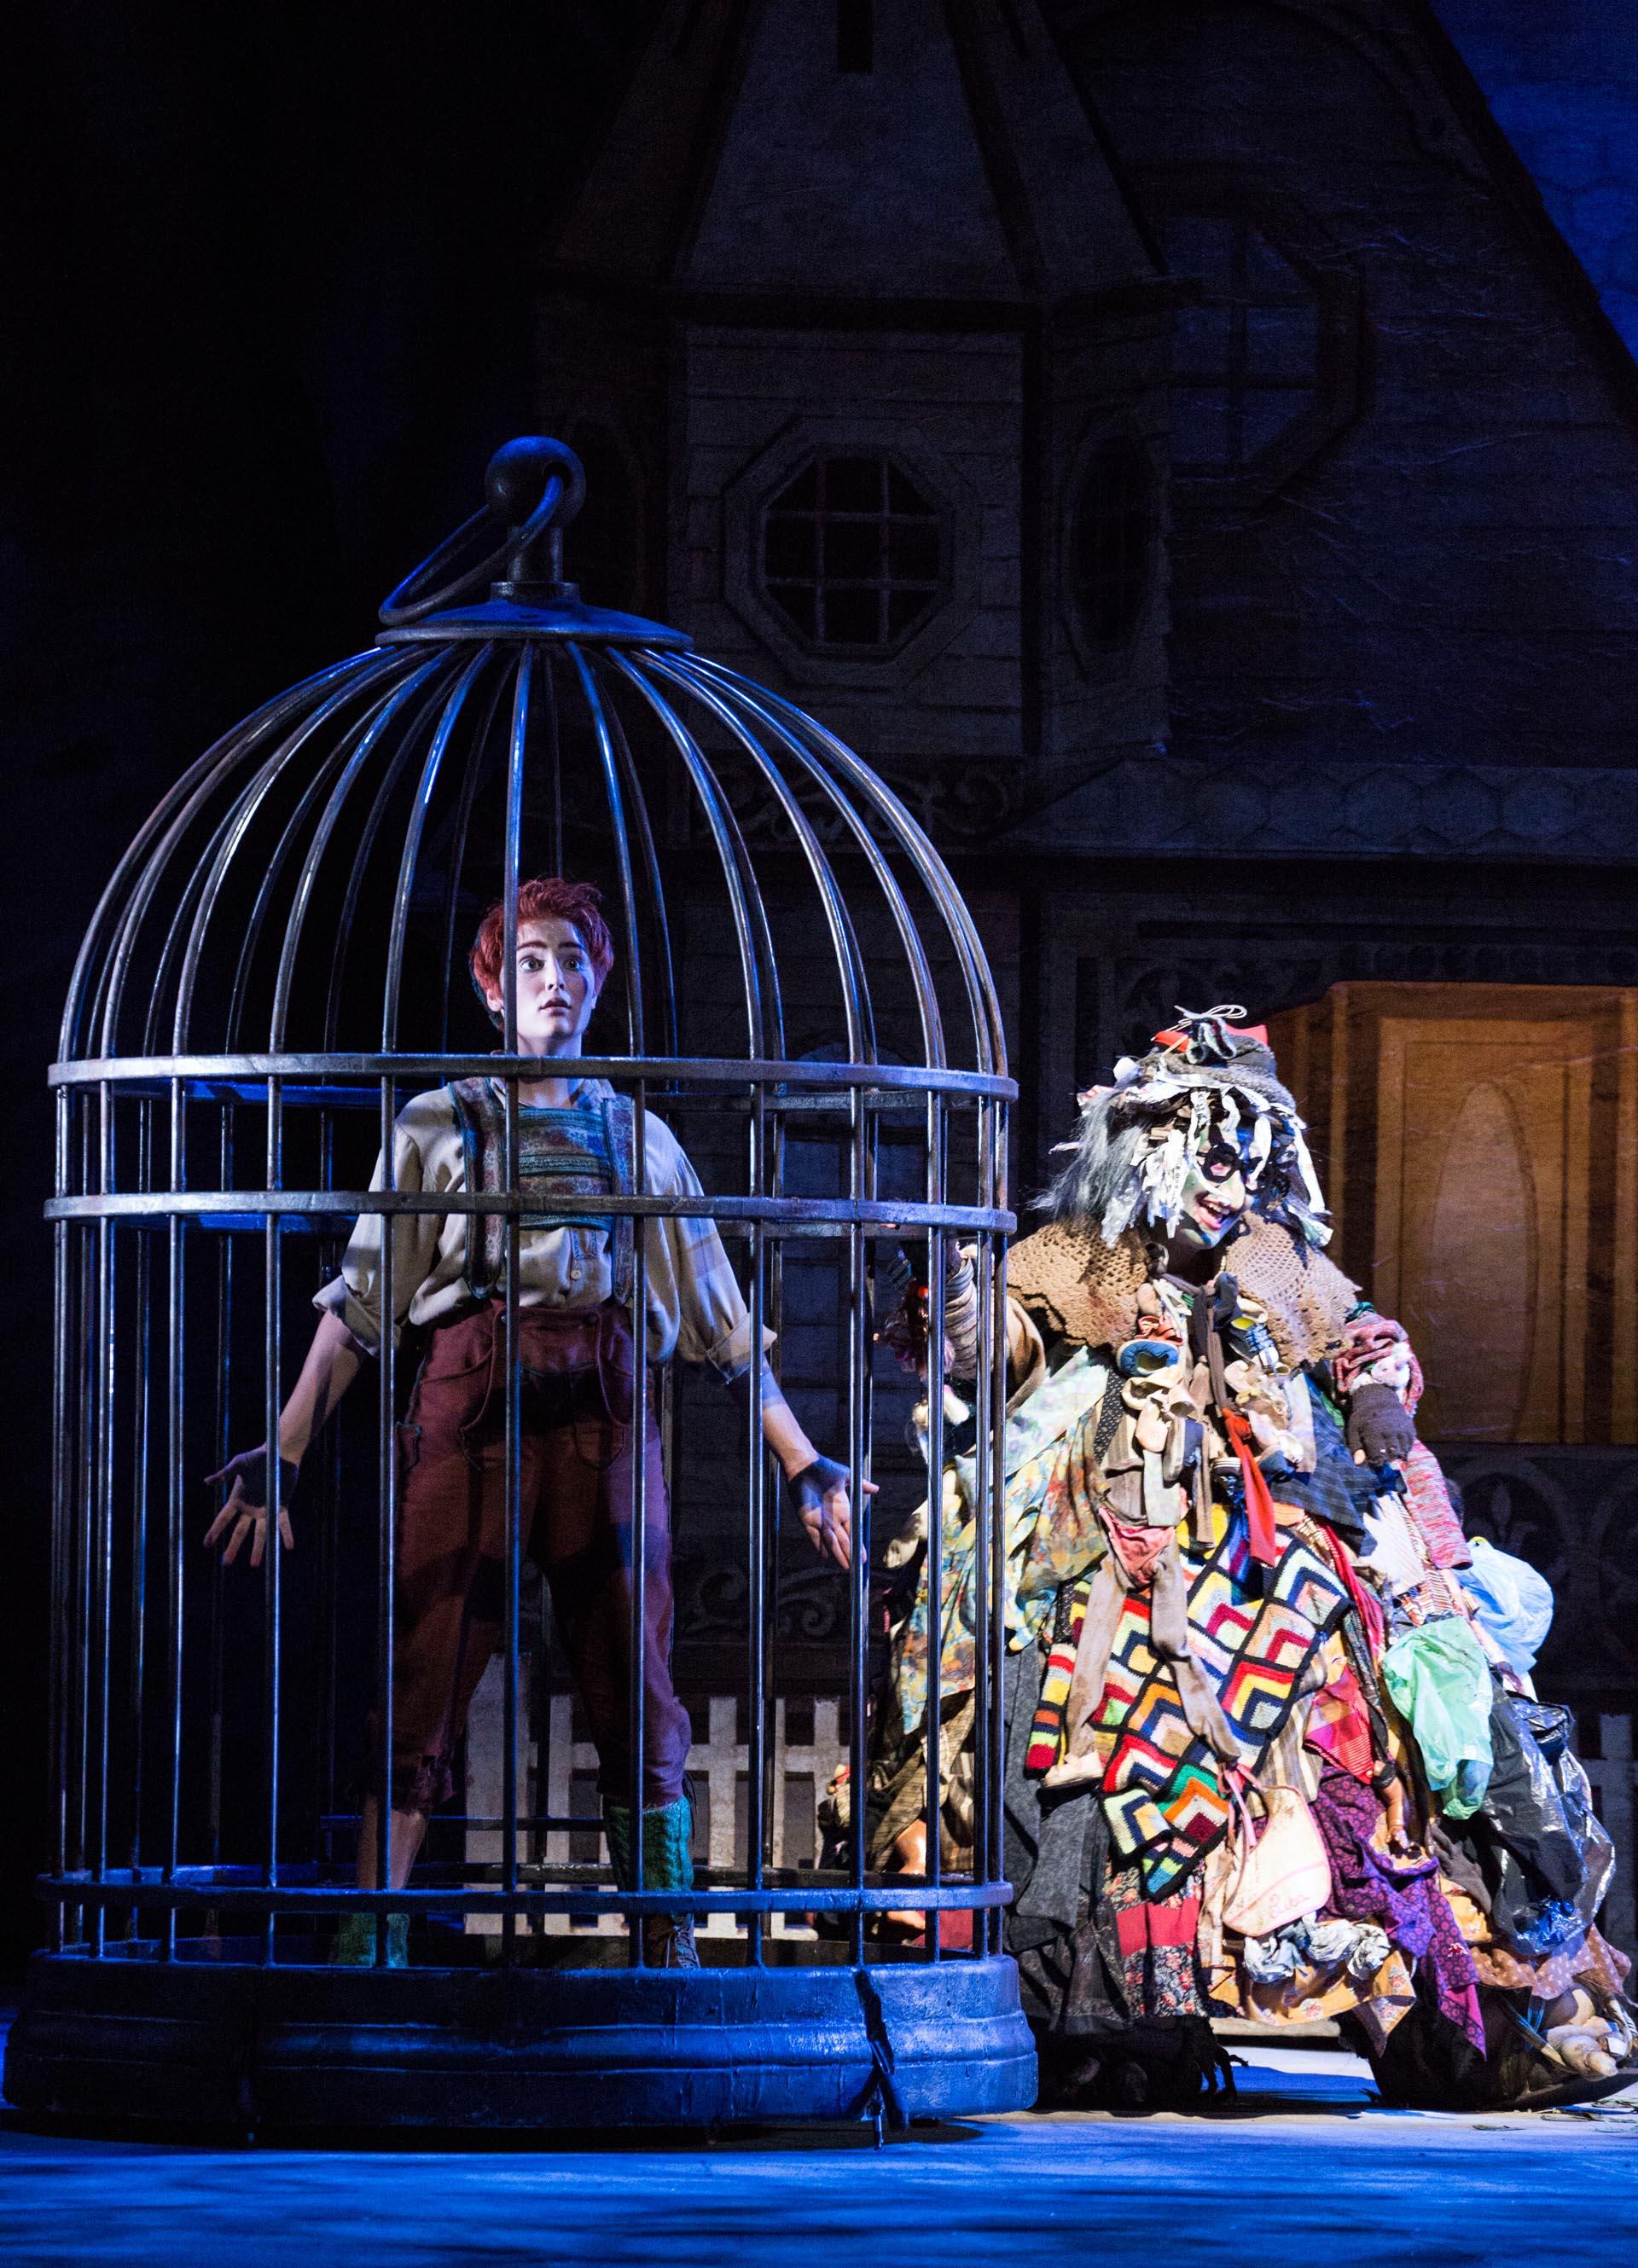 12 Hänsel und Gretel, Teatro alla Scala, 2017, © Brescia und Amisano